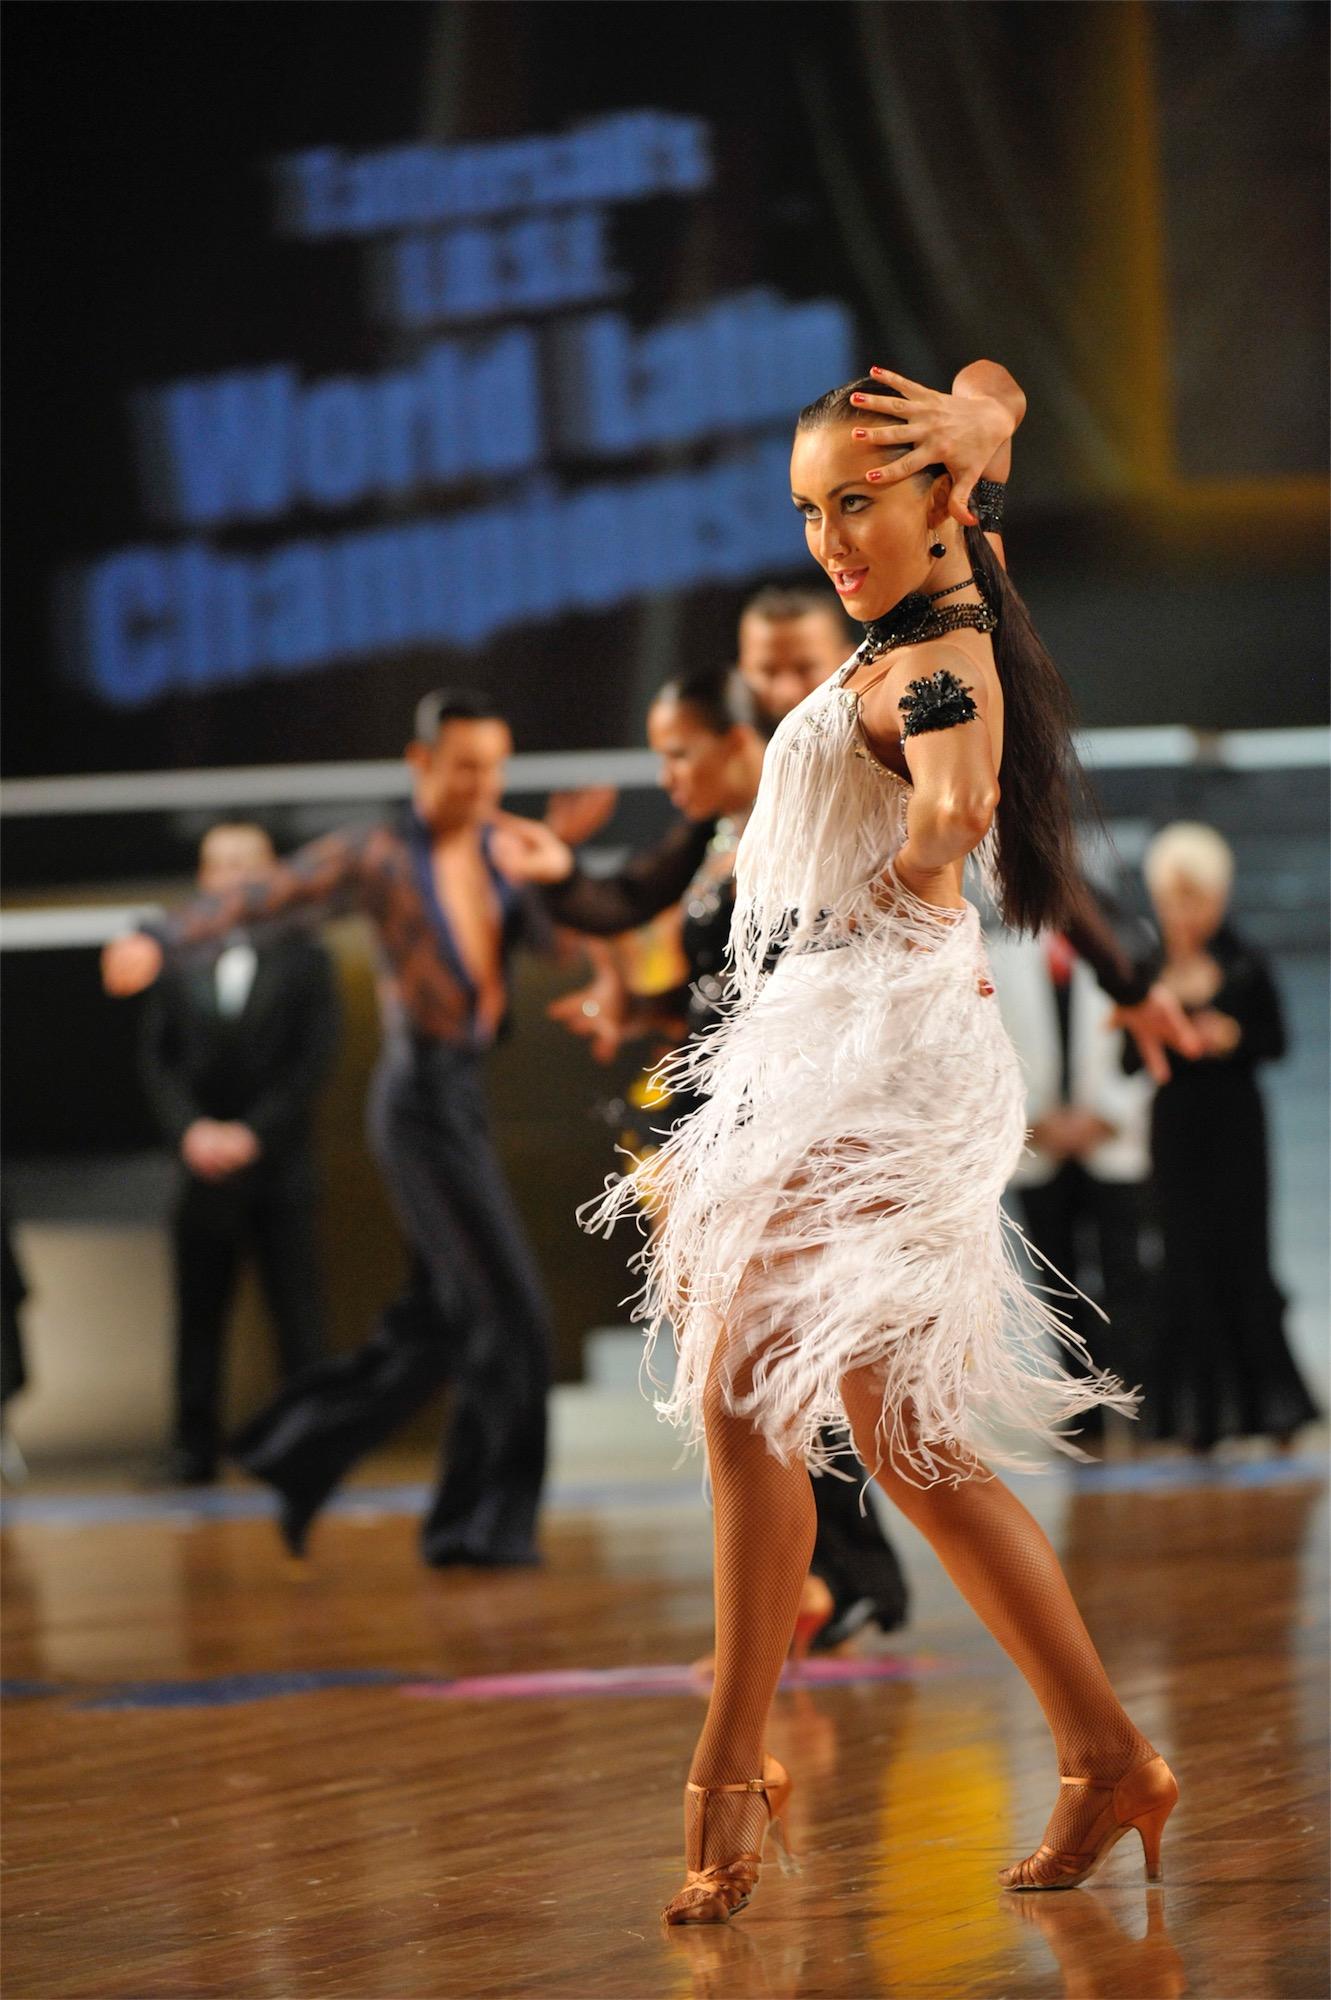 Dancesport